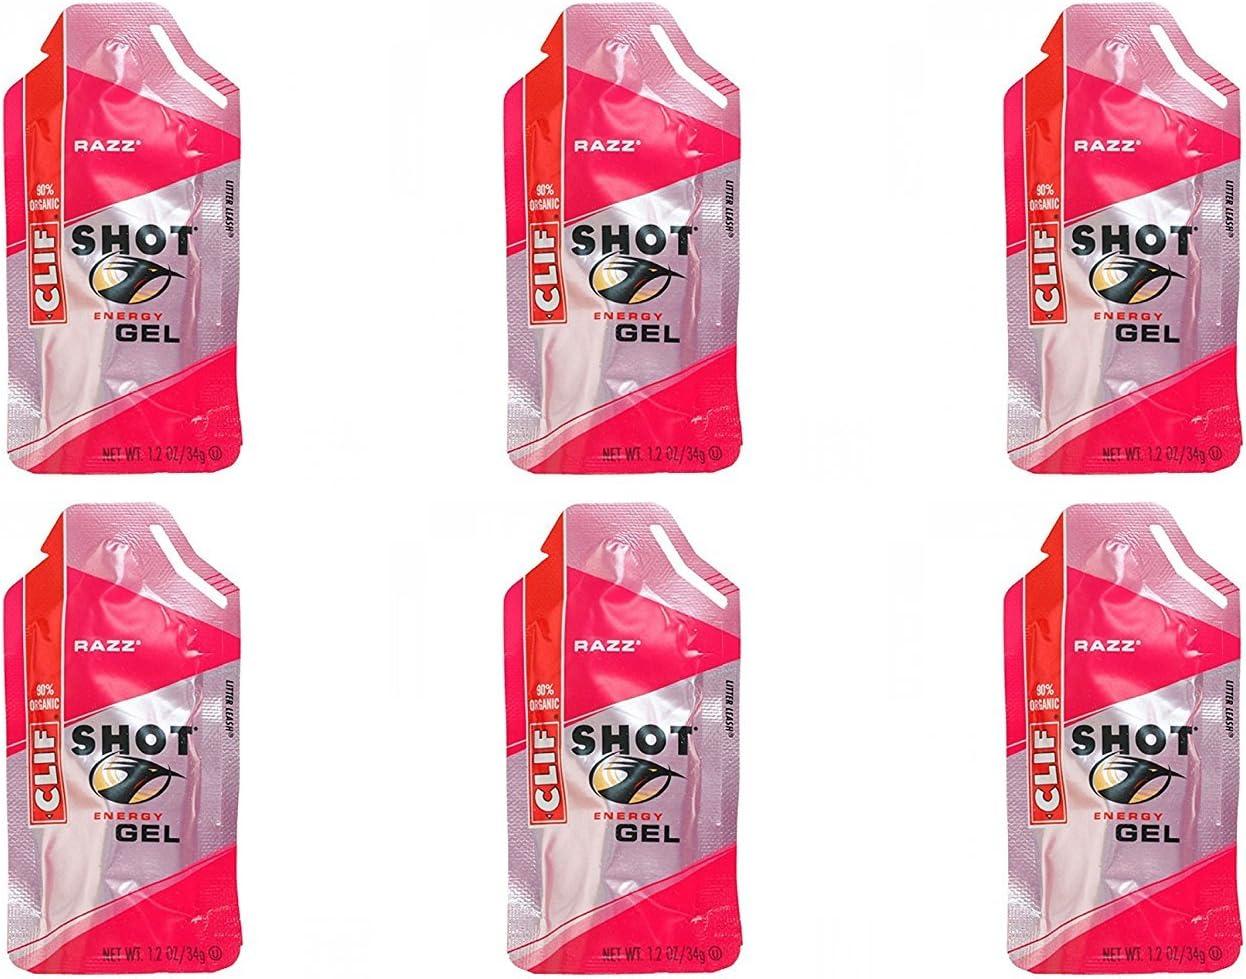 Clif Shot Gel - Razz - 6 Pack (6 x 1.2oz Packs)